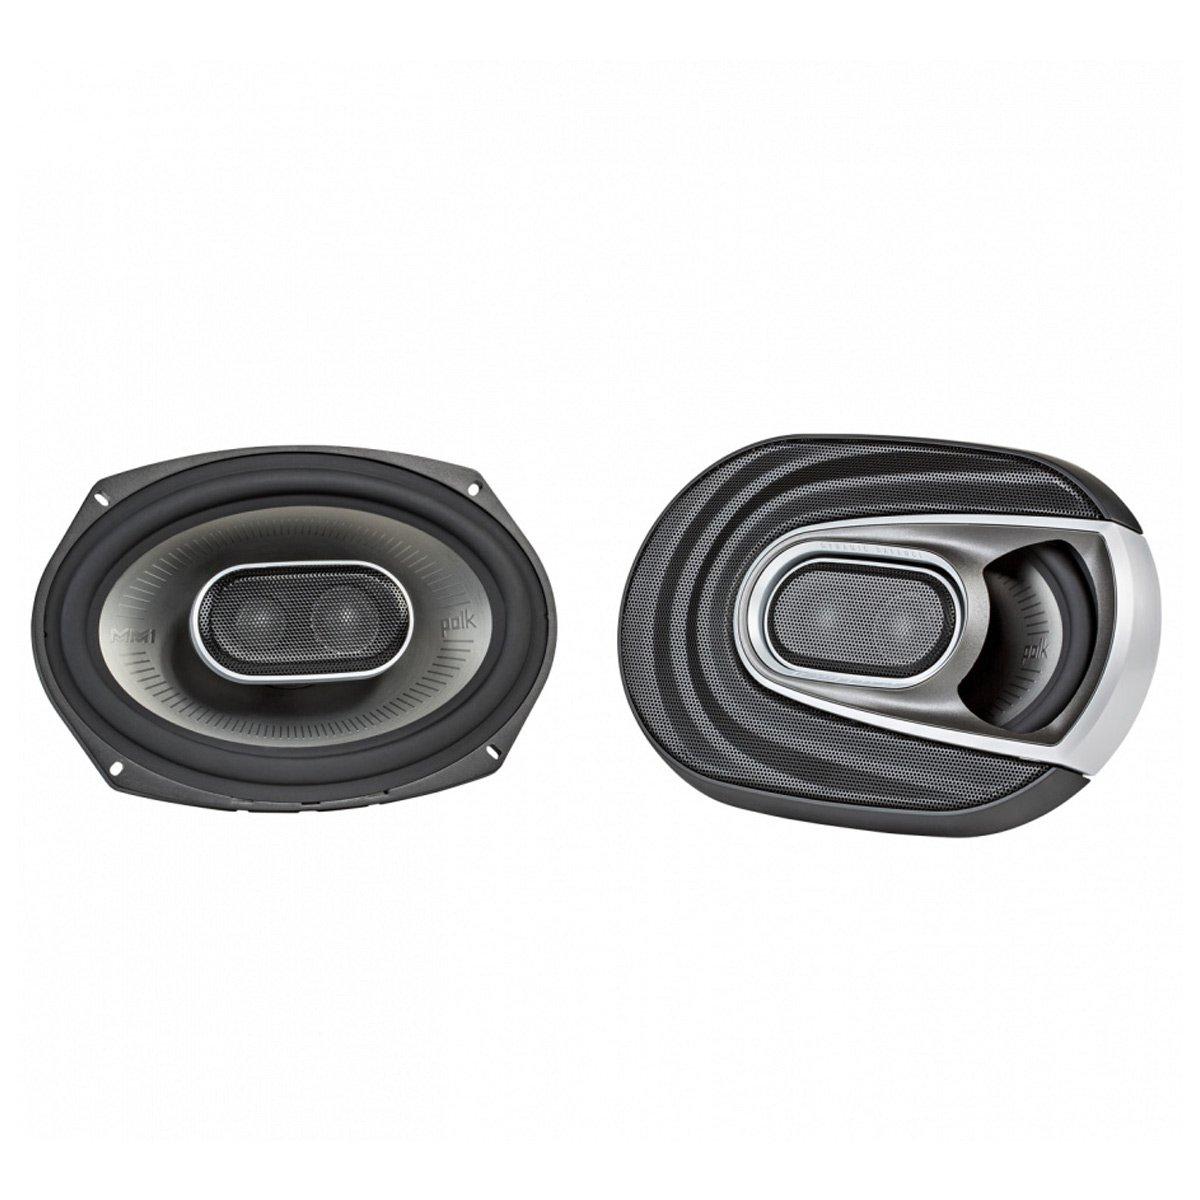 Polk Audio MM1 Series 6x9 Inch 450W Coaxial Marine Boat ATV Car Audio Speakers